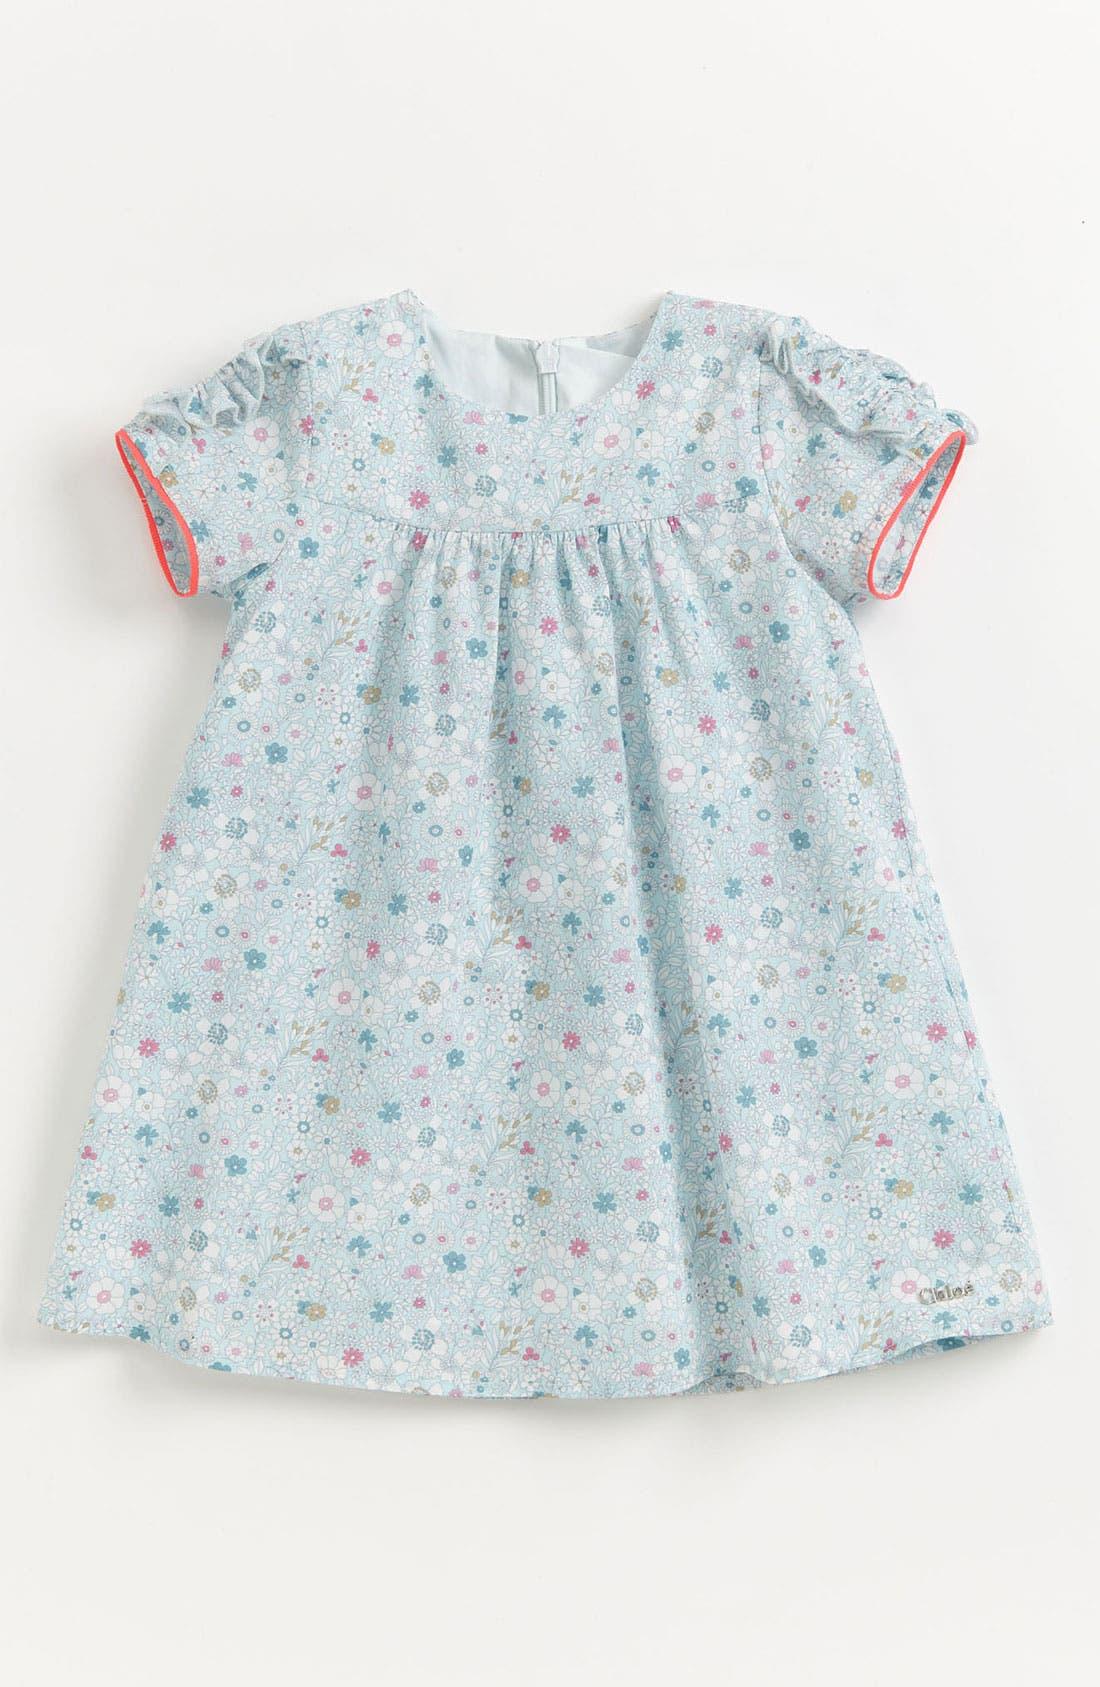 Main Image - Chloé 'Liberty Print' Floral Dress (Baby)